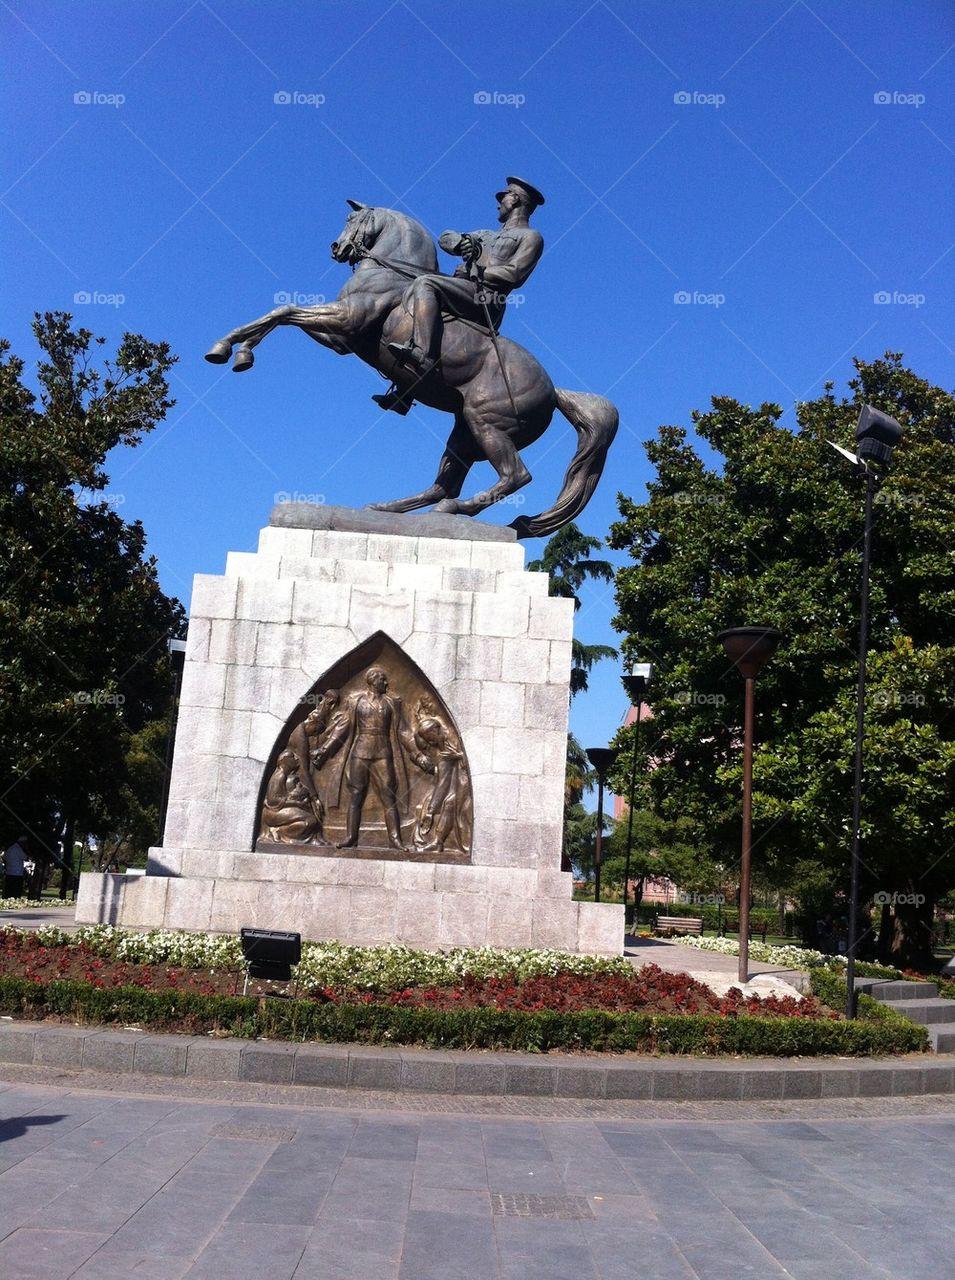 statue of Atatürk on his horse